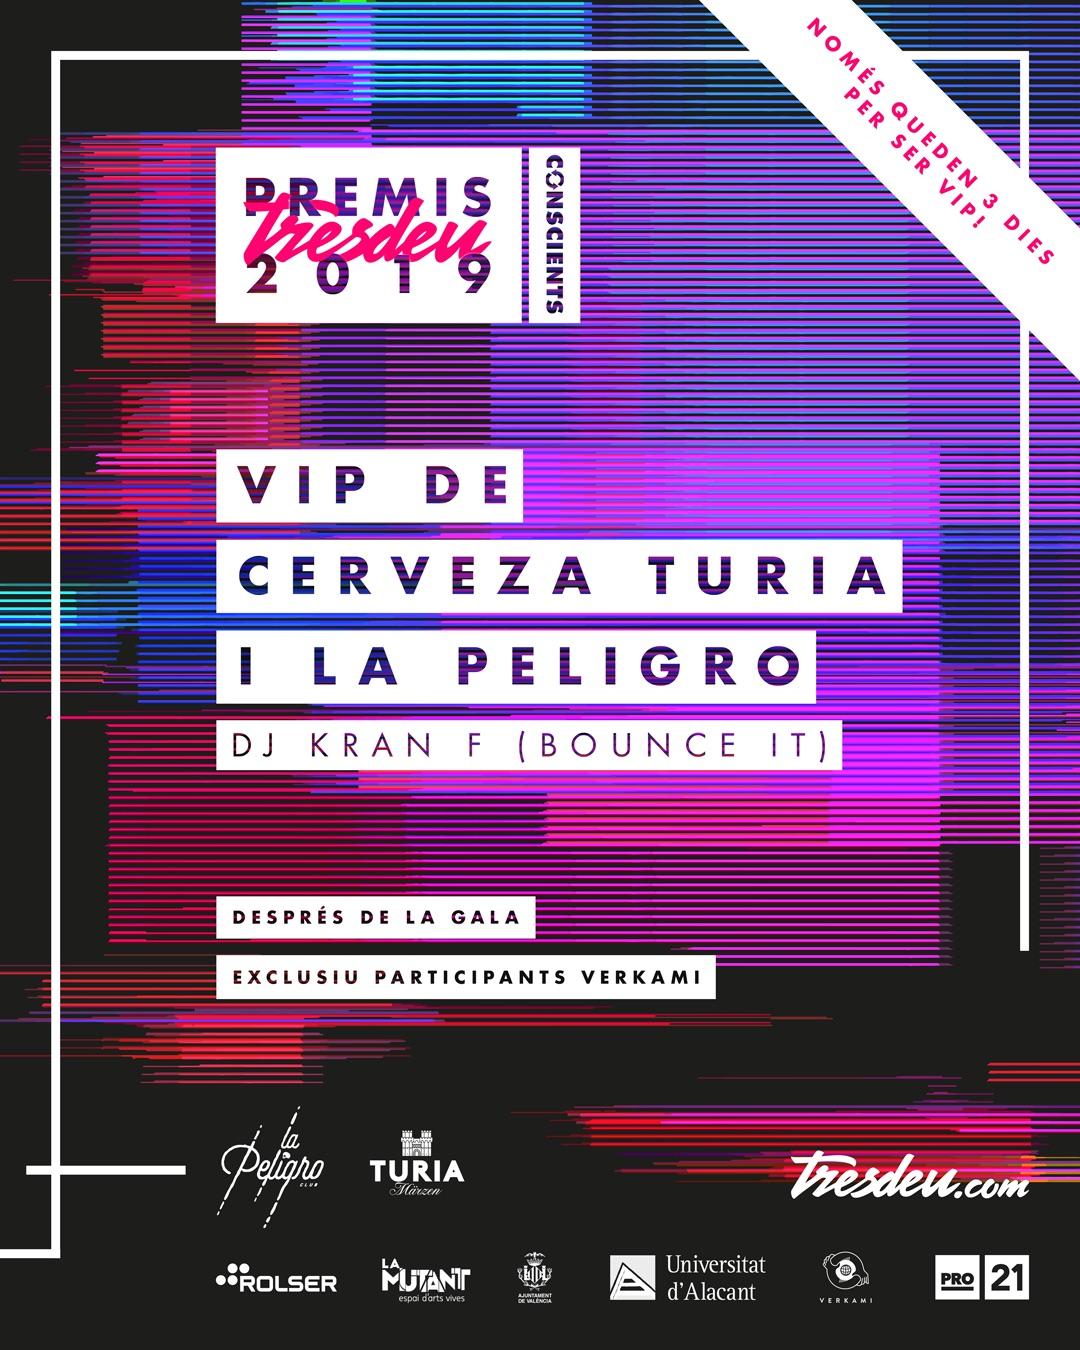 VIP Premis Tresdeu 2019